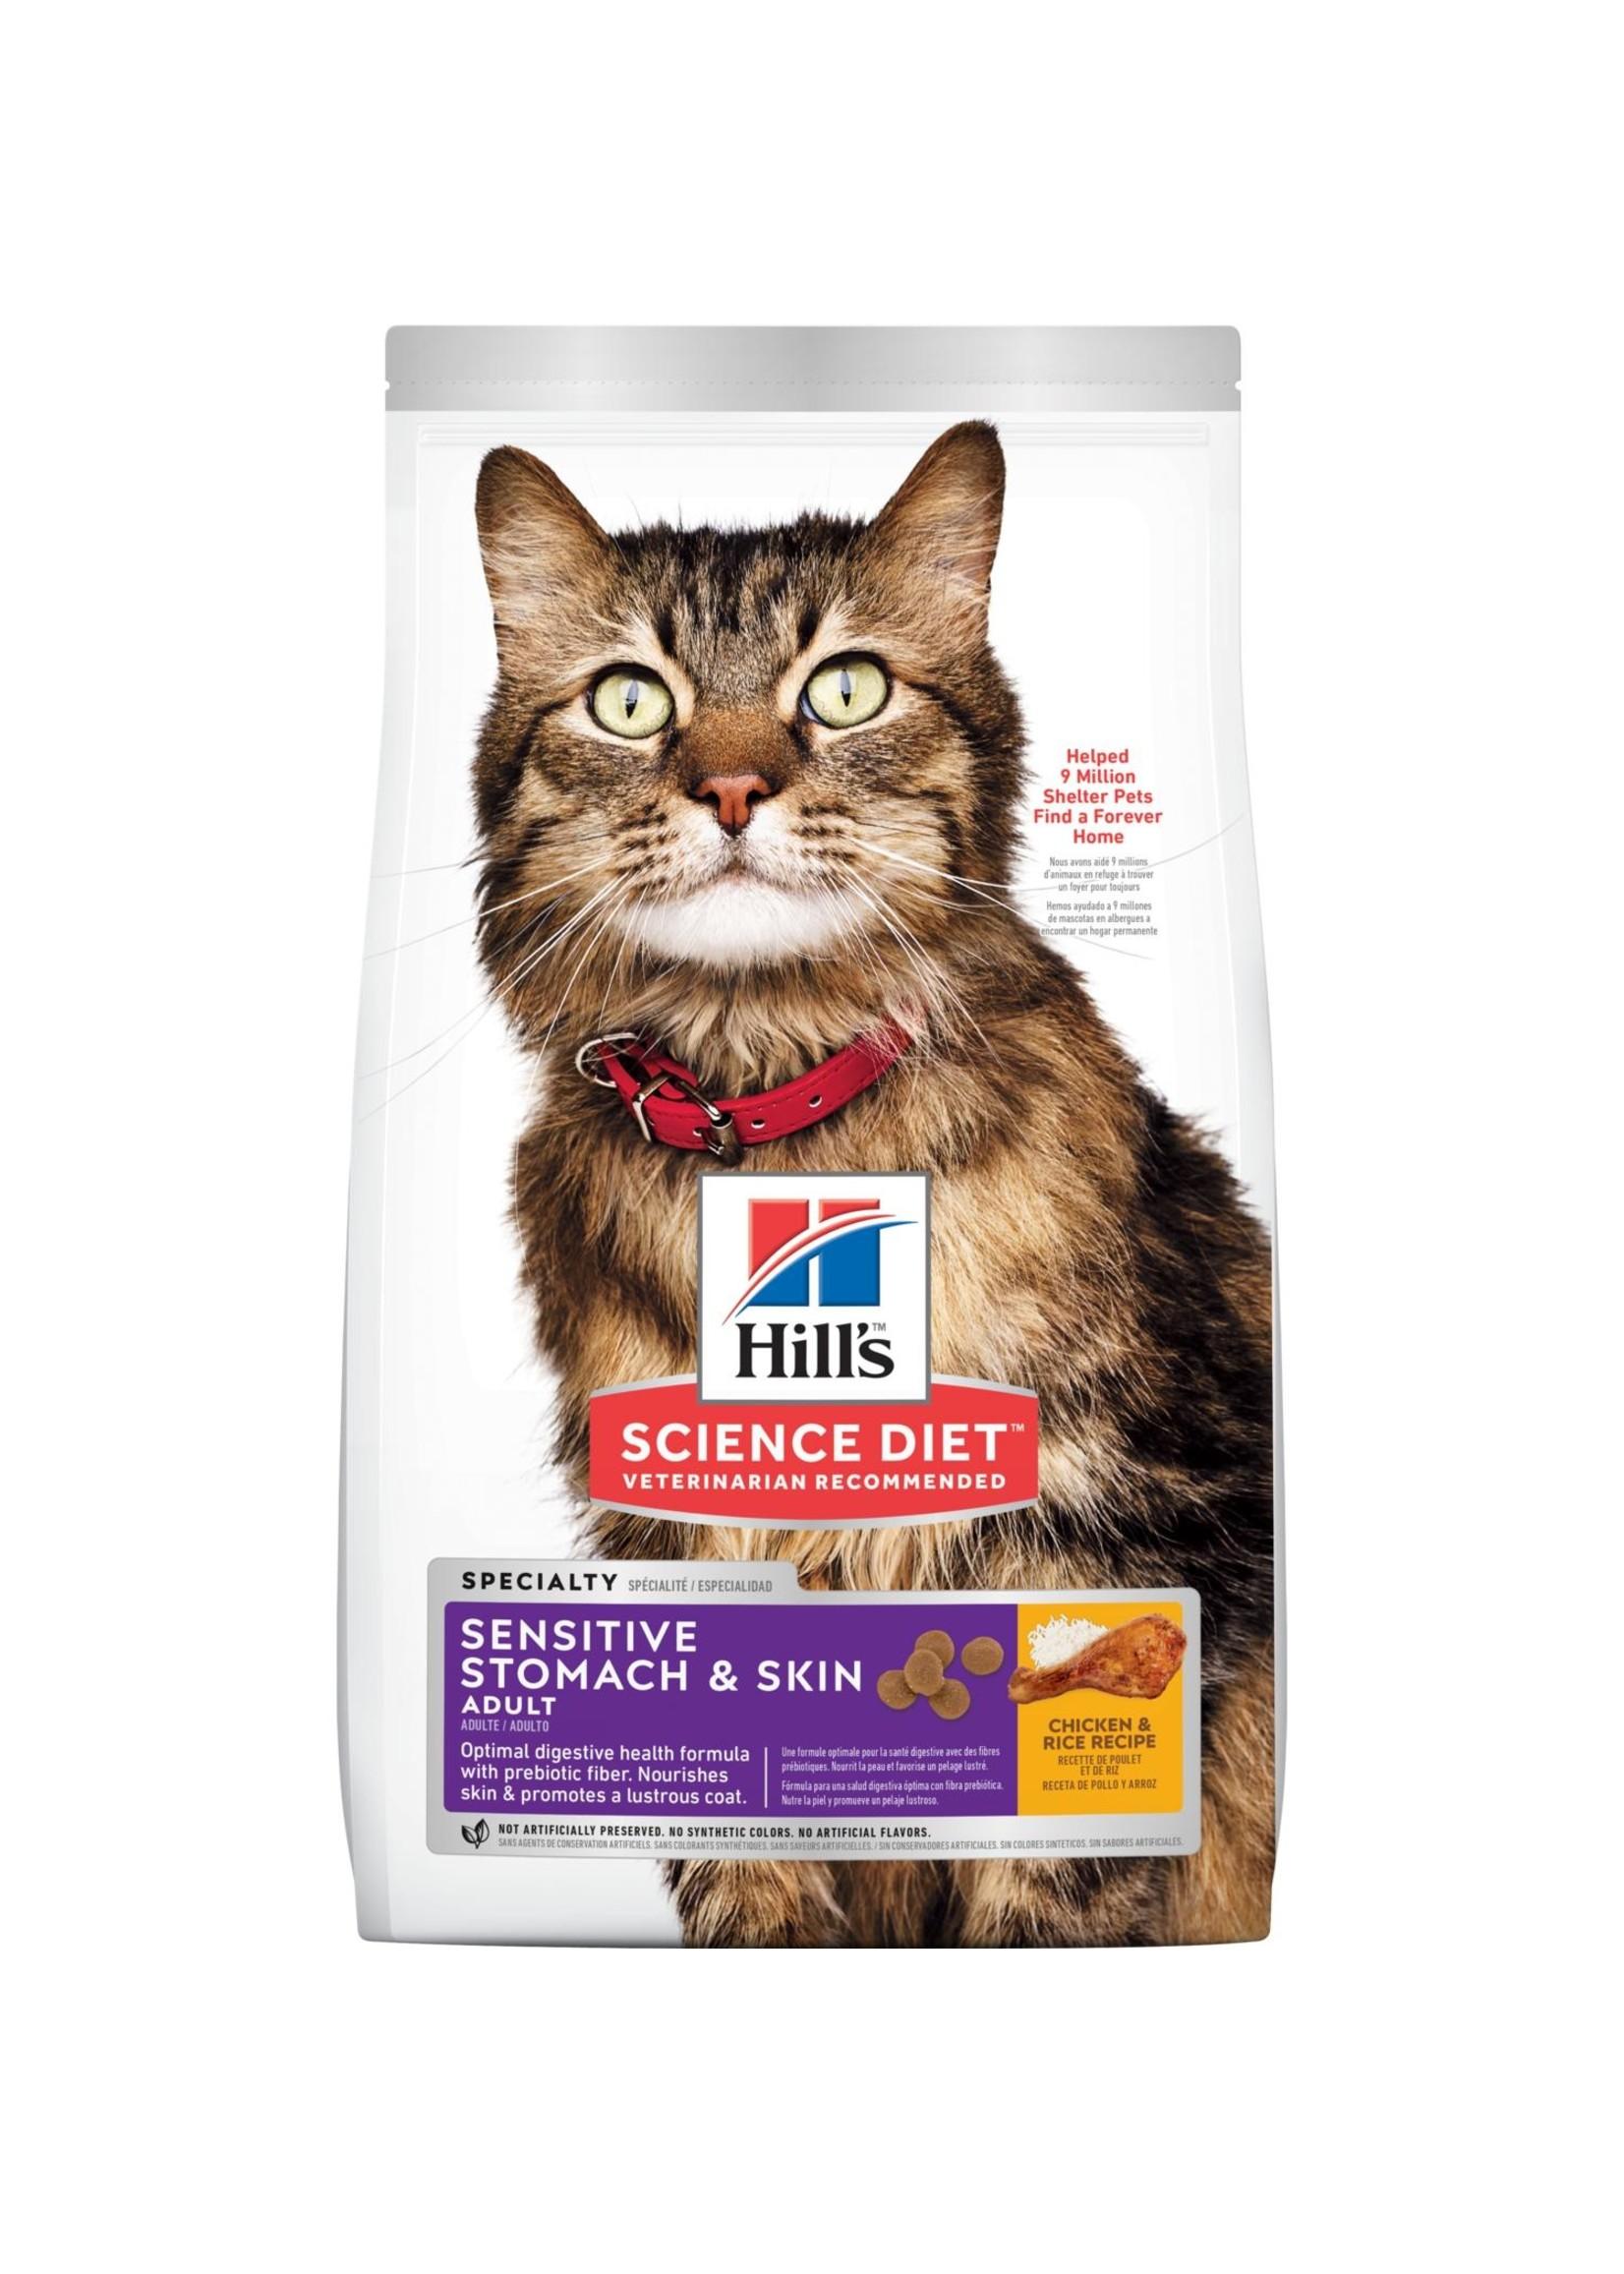 Hill's Science Diet Hill's Science Diet Adult Sensitive Stomach & Skin Cat Food, 3.5lb Bag